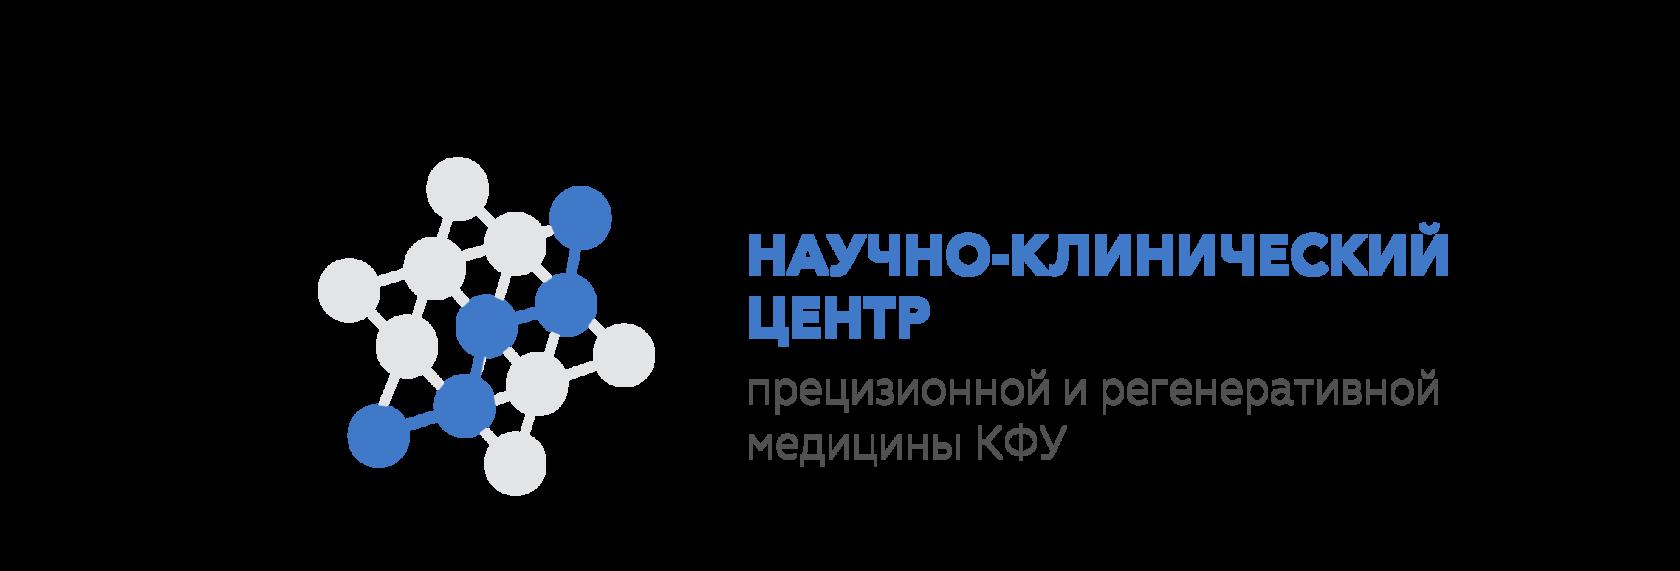 НКЦ ПРМ КФУ